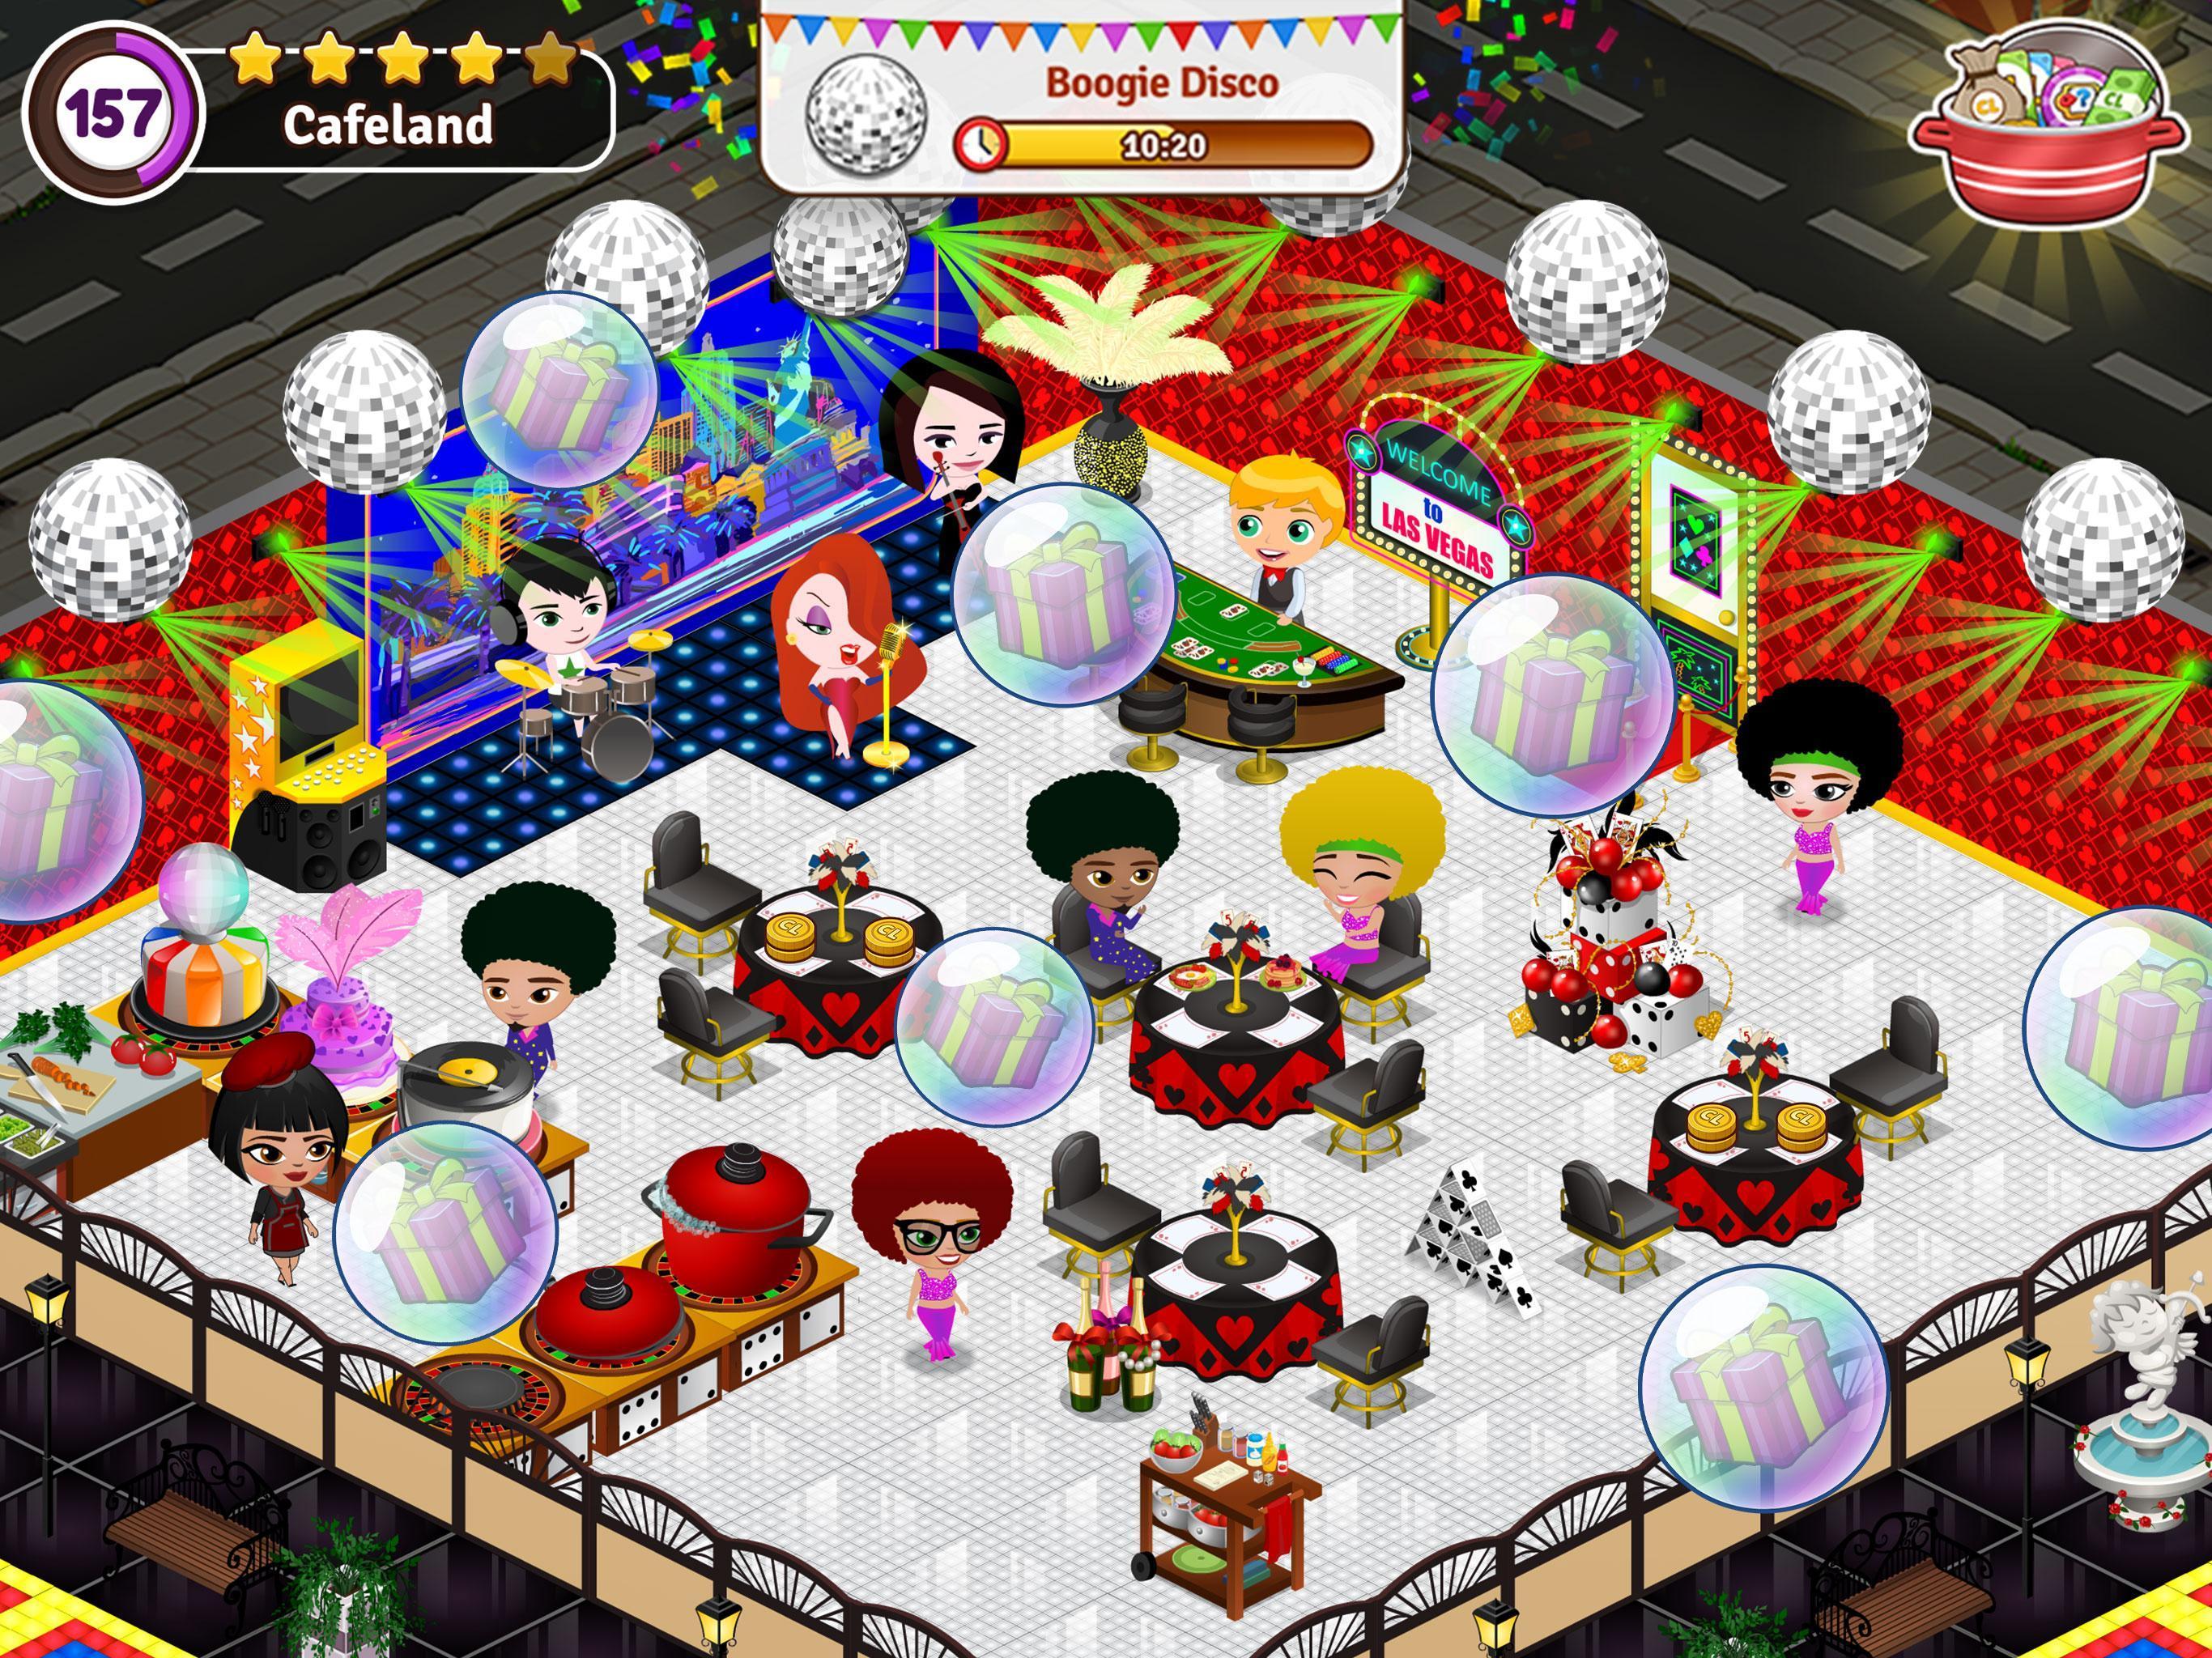 cafeland game free download full version